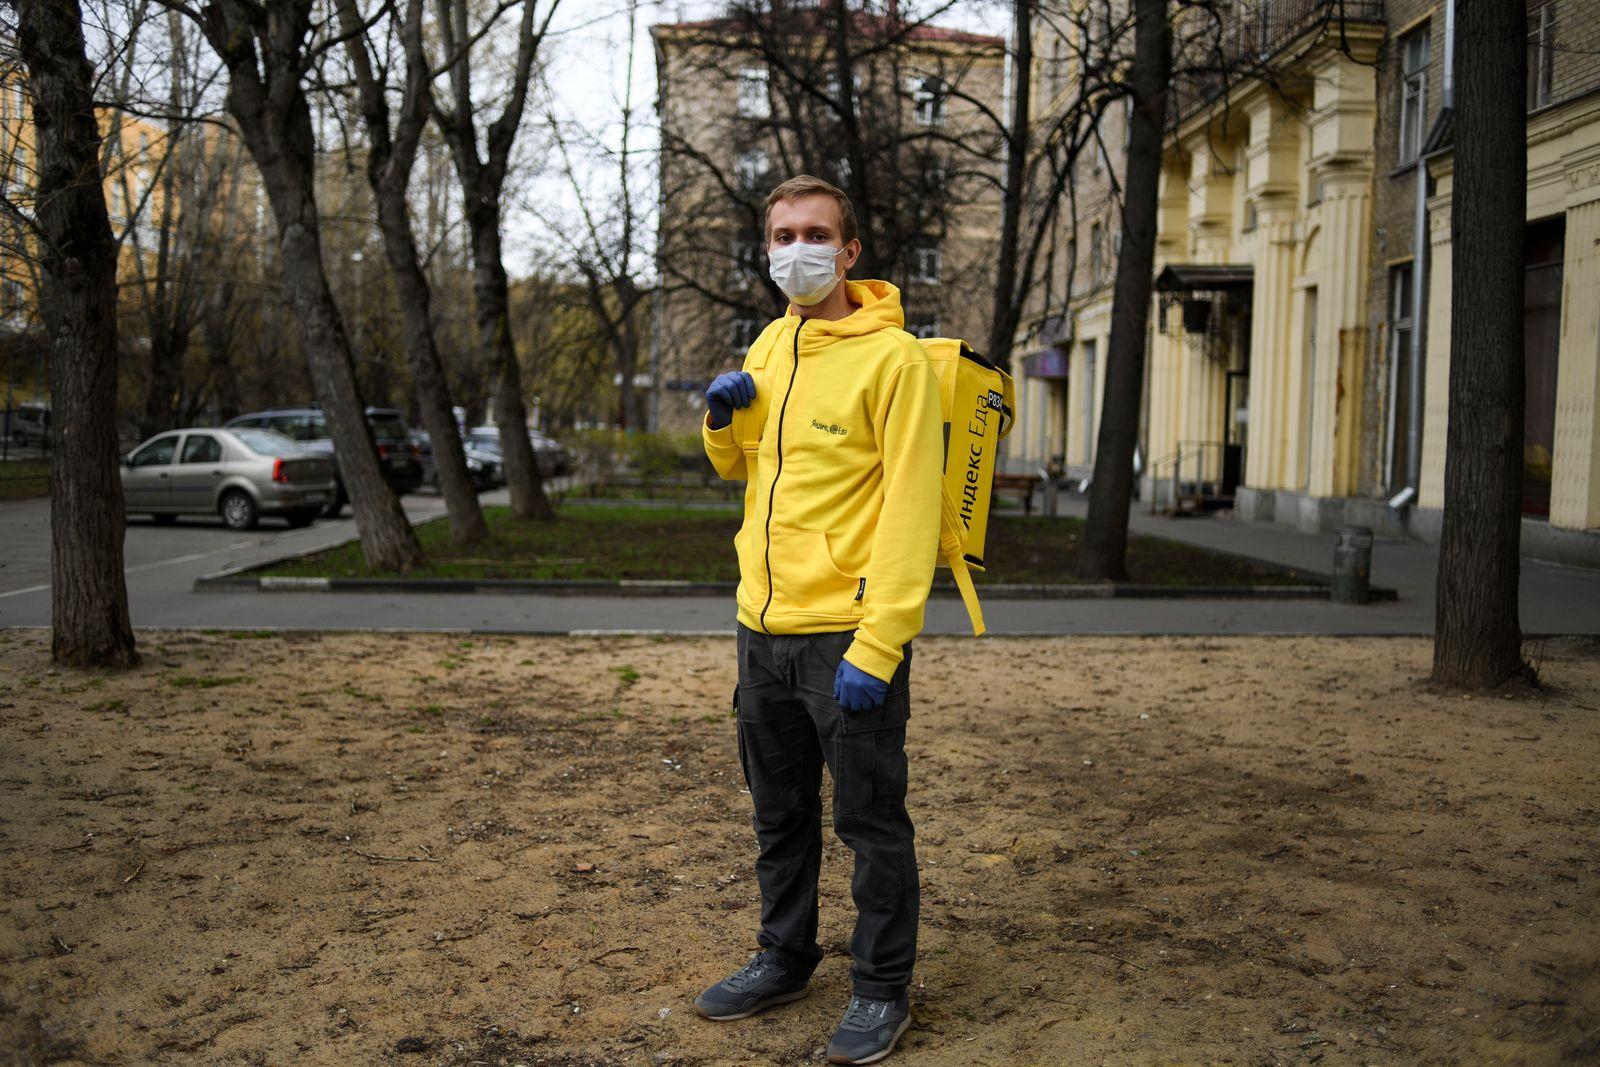 RUSSIA-HEALTH-VIRUS-MAYDAY-PHOTO ESSAY